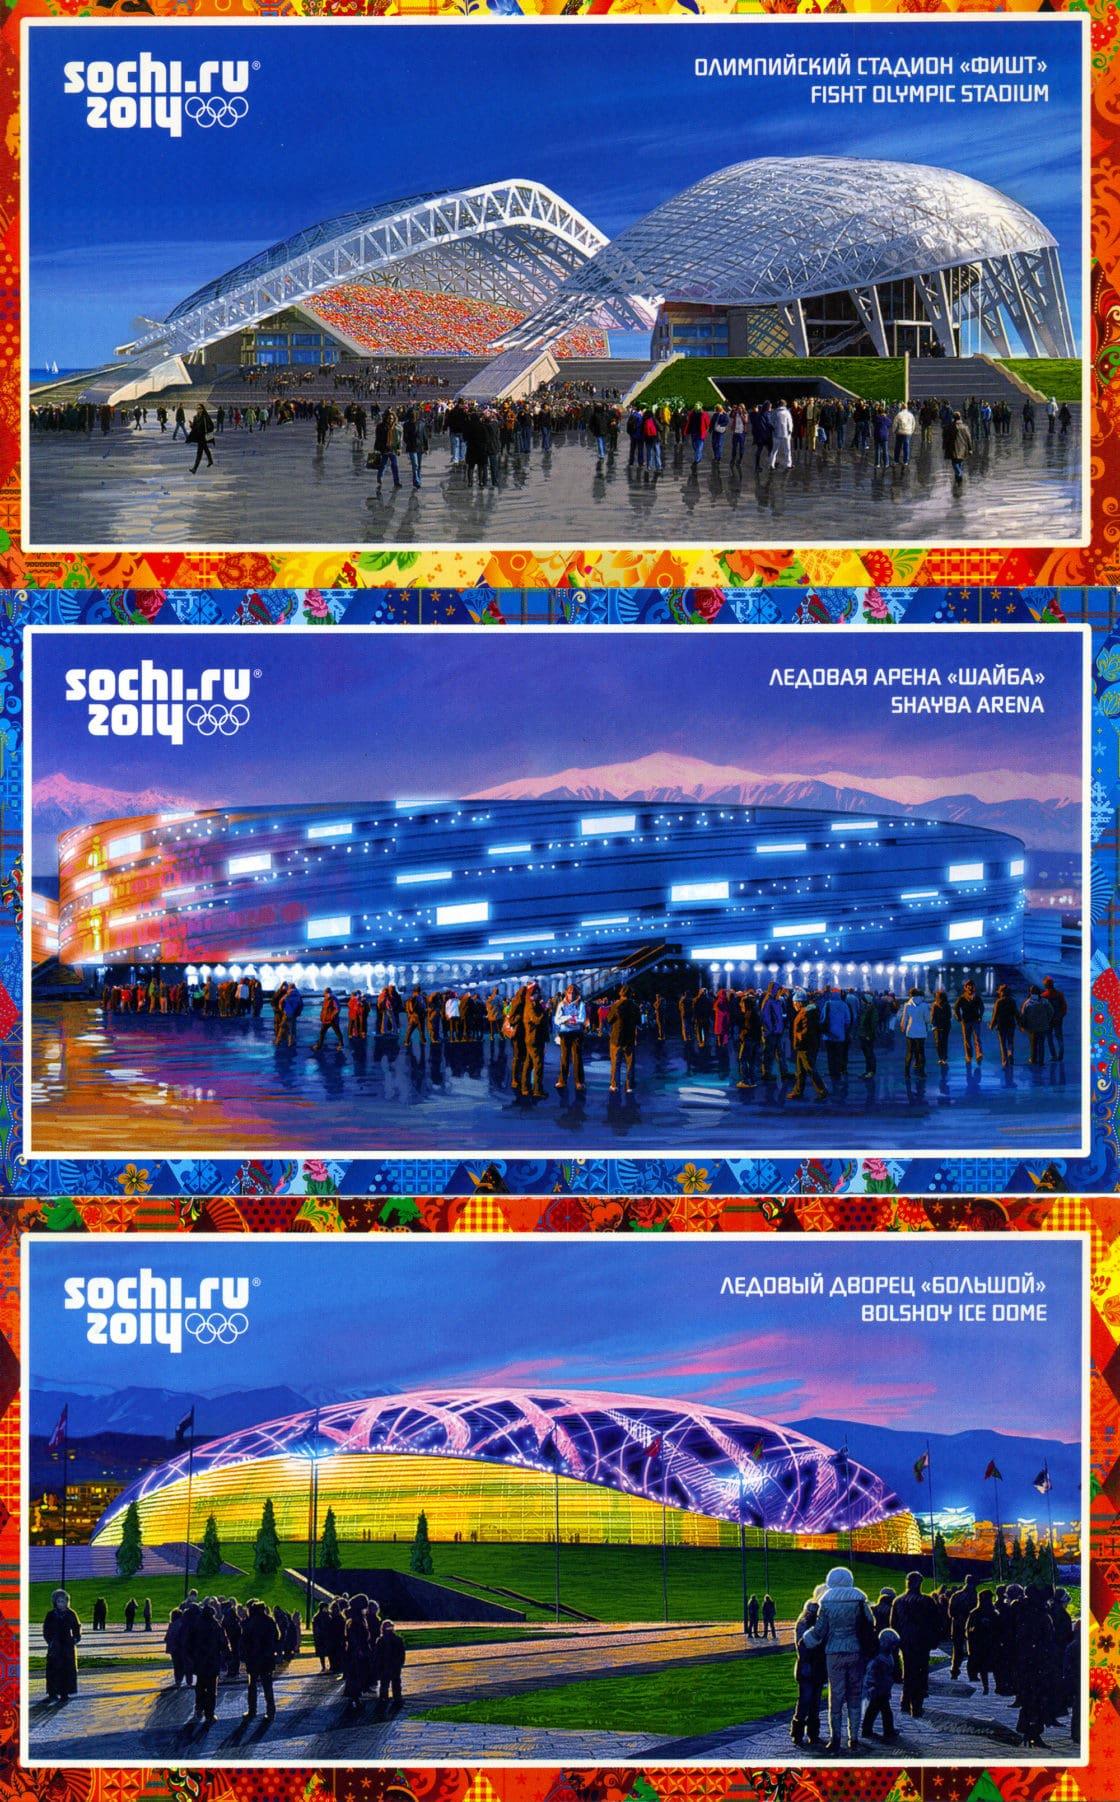 postcards-sochi-olympics-victor-ruano-santasombra